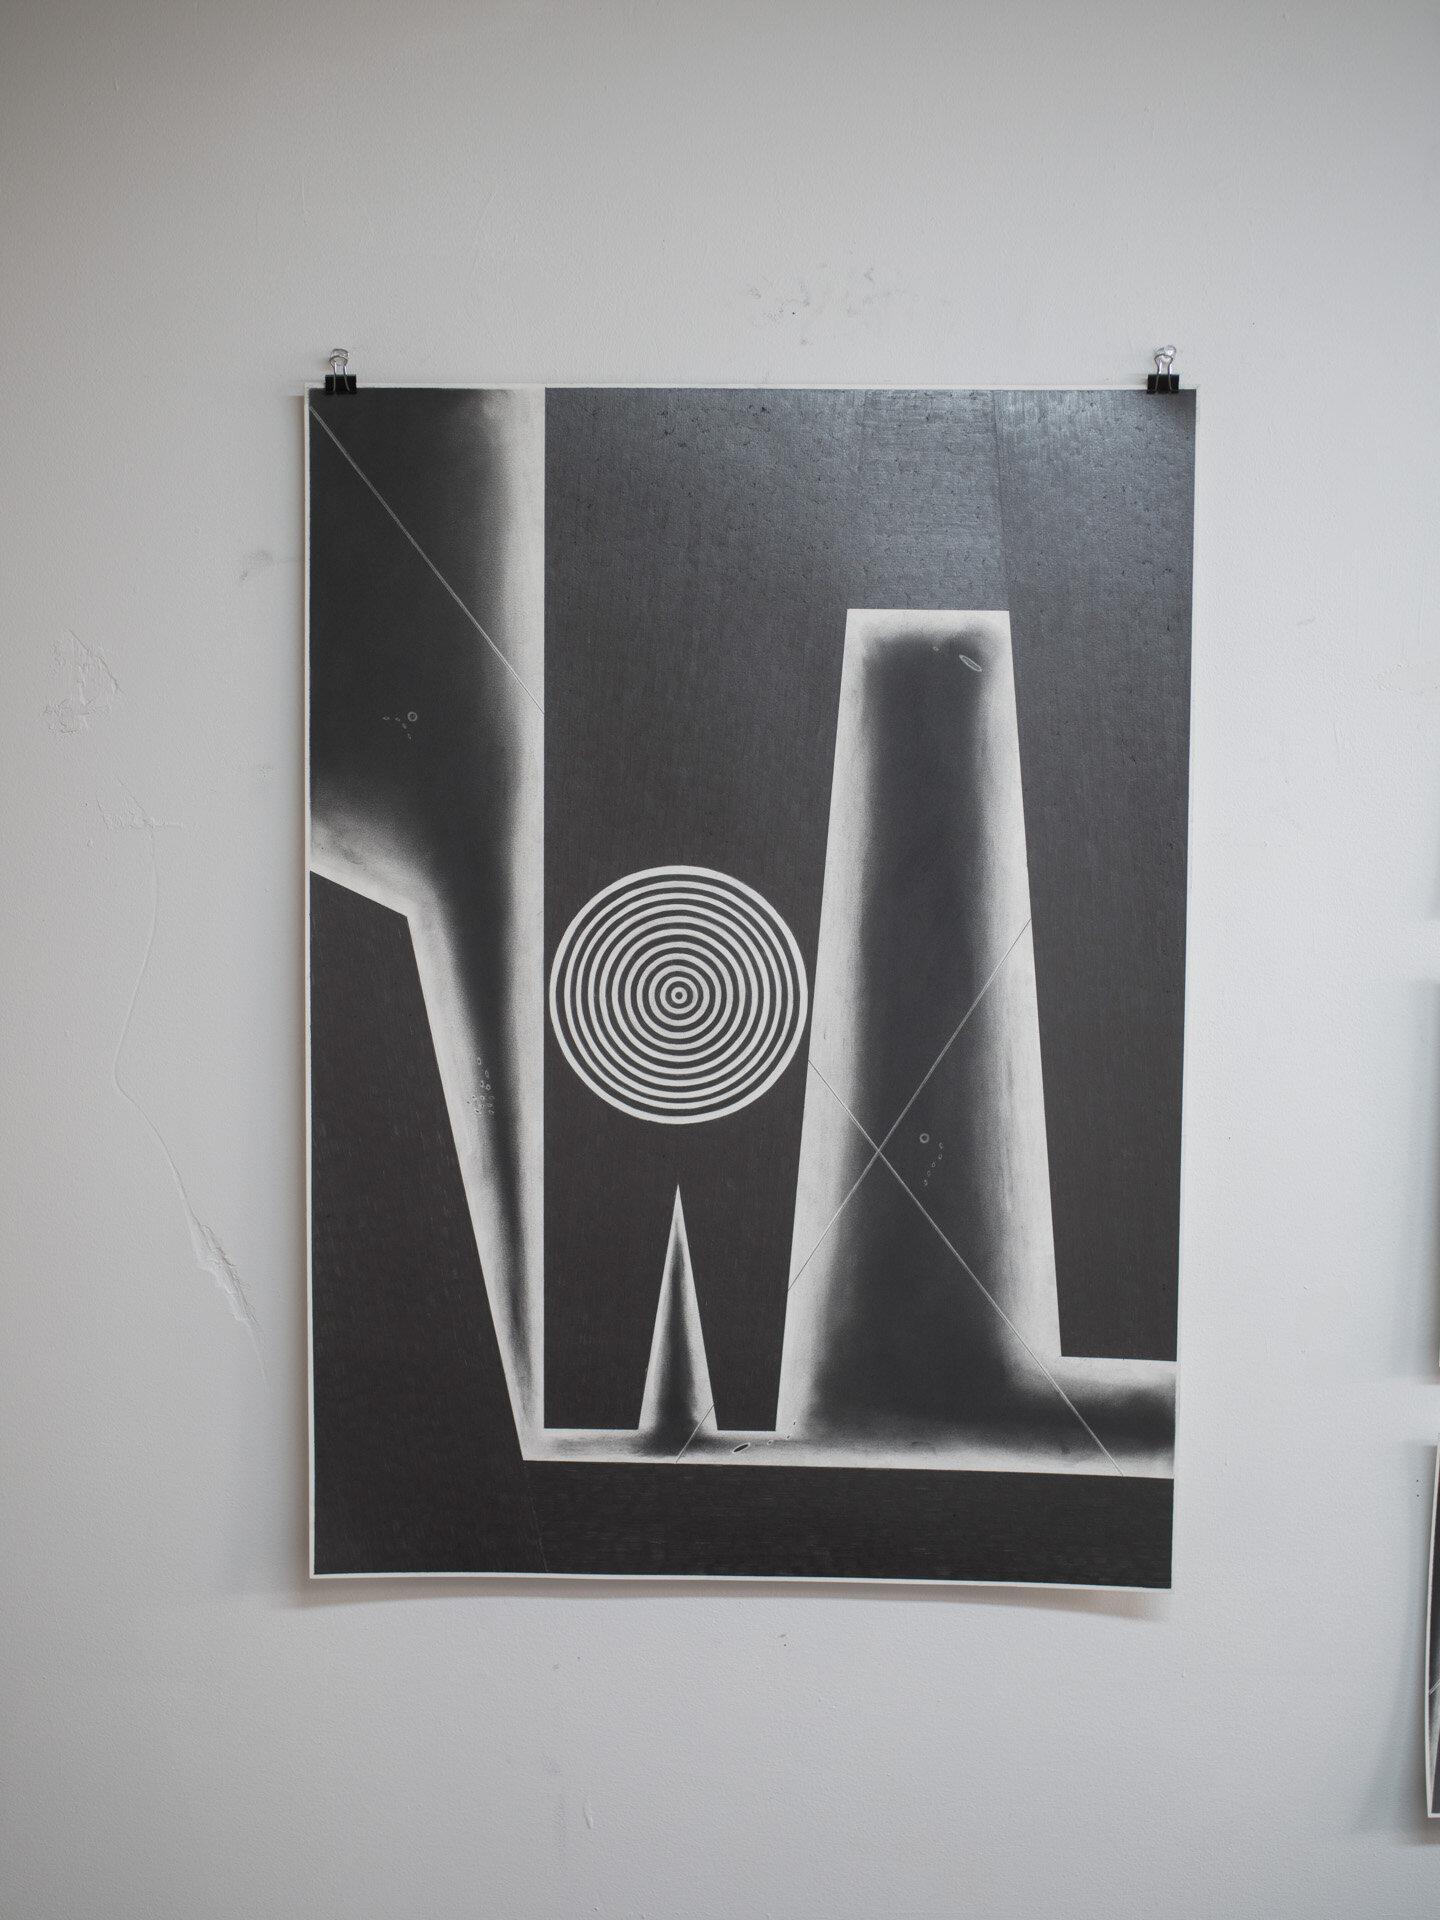 wassaic-project-artist-charles-sommer-2019-05-28-15-06-17.jpg